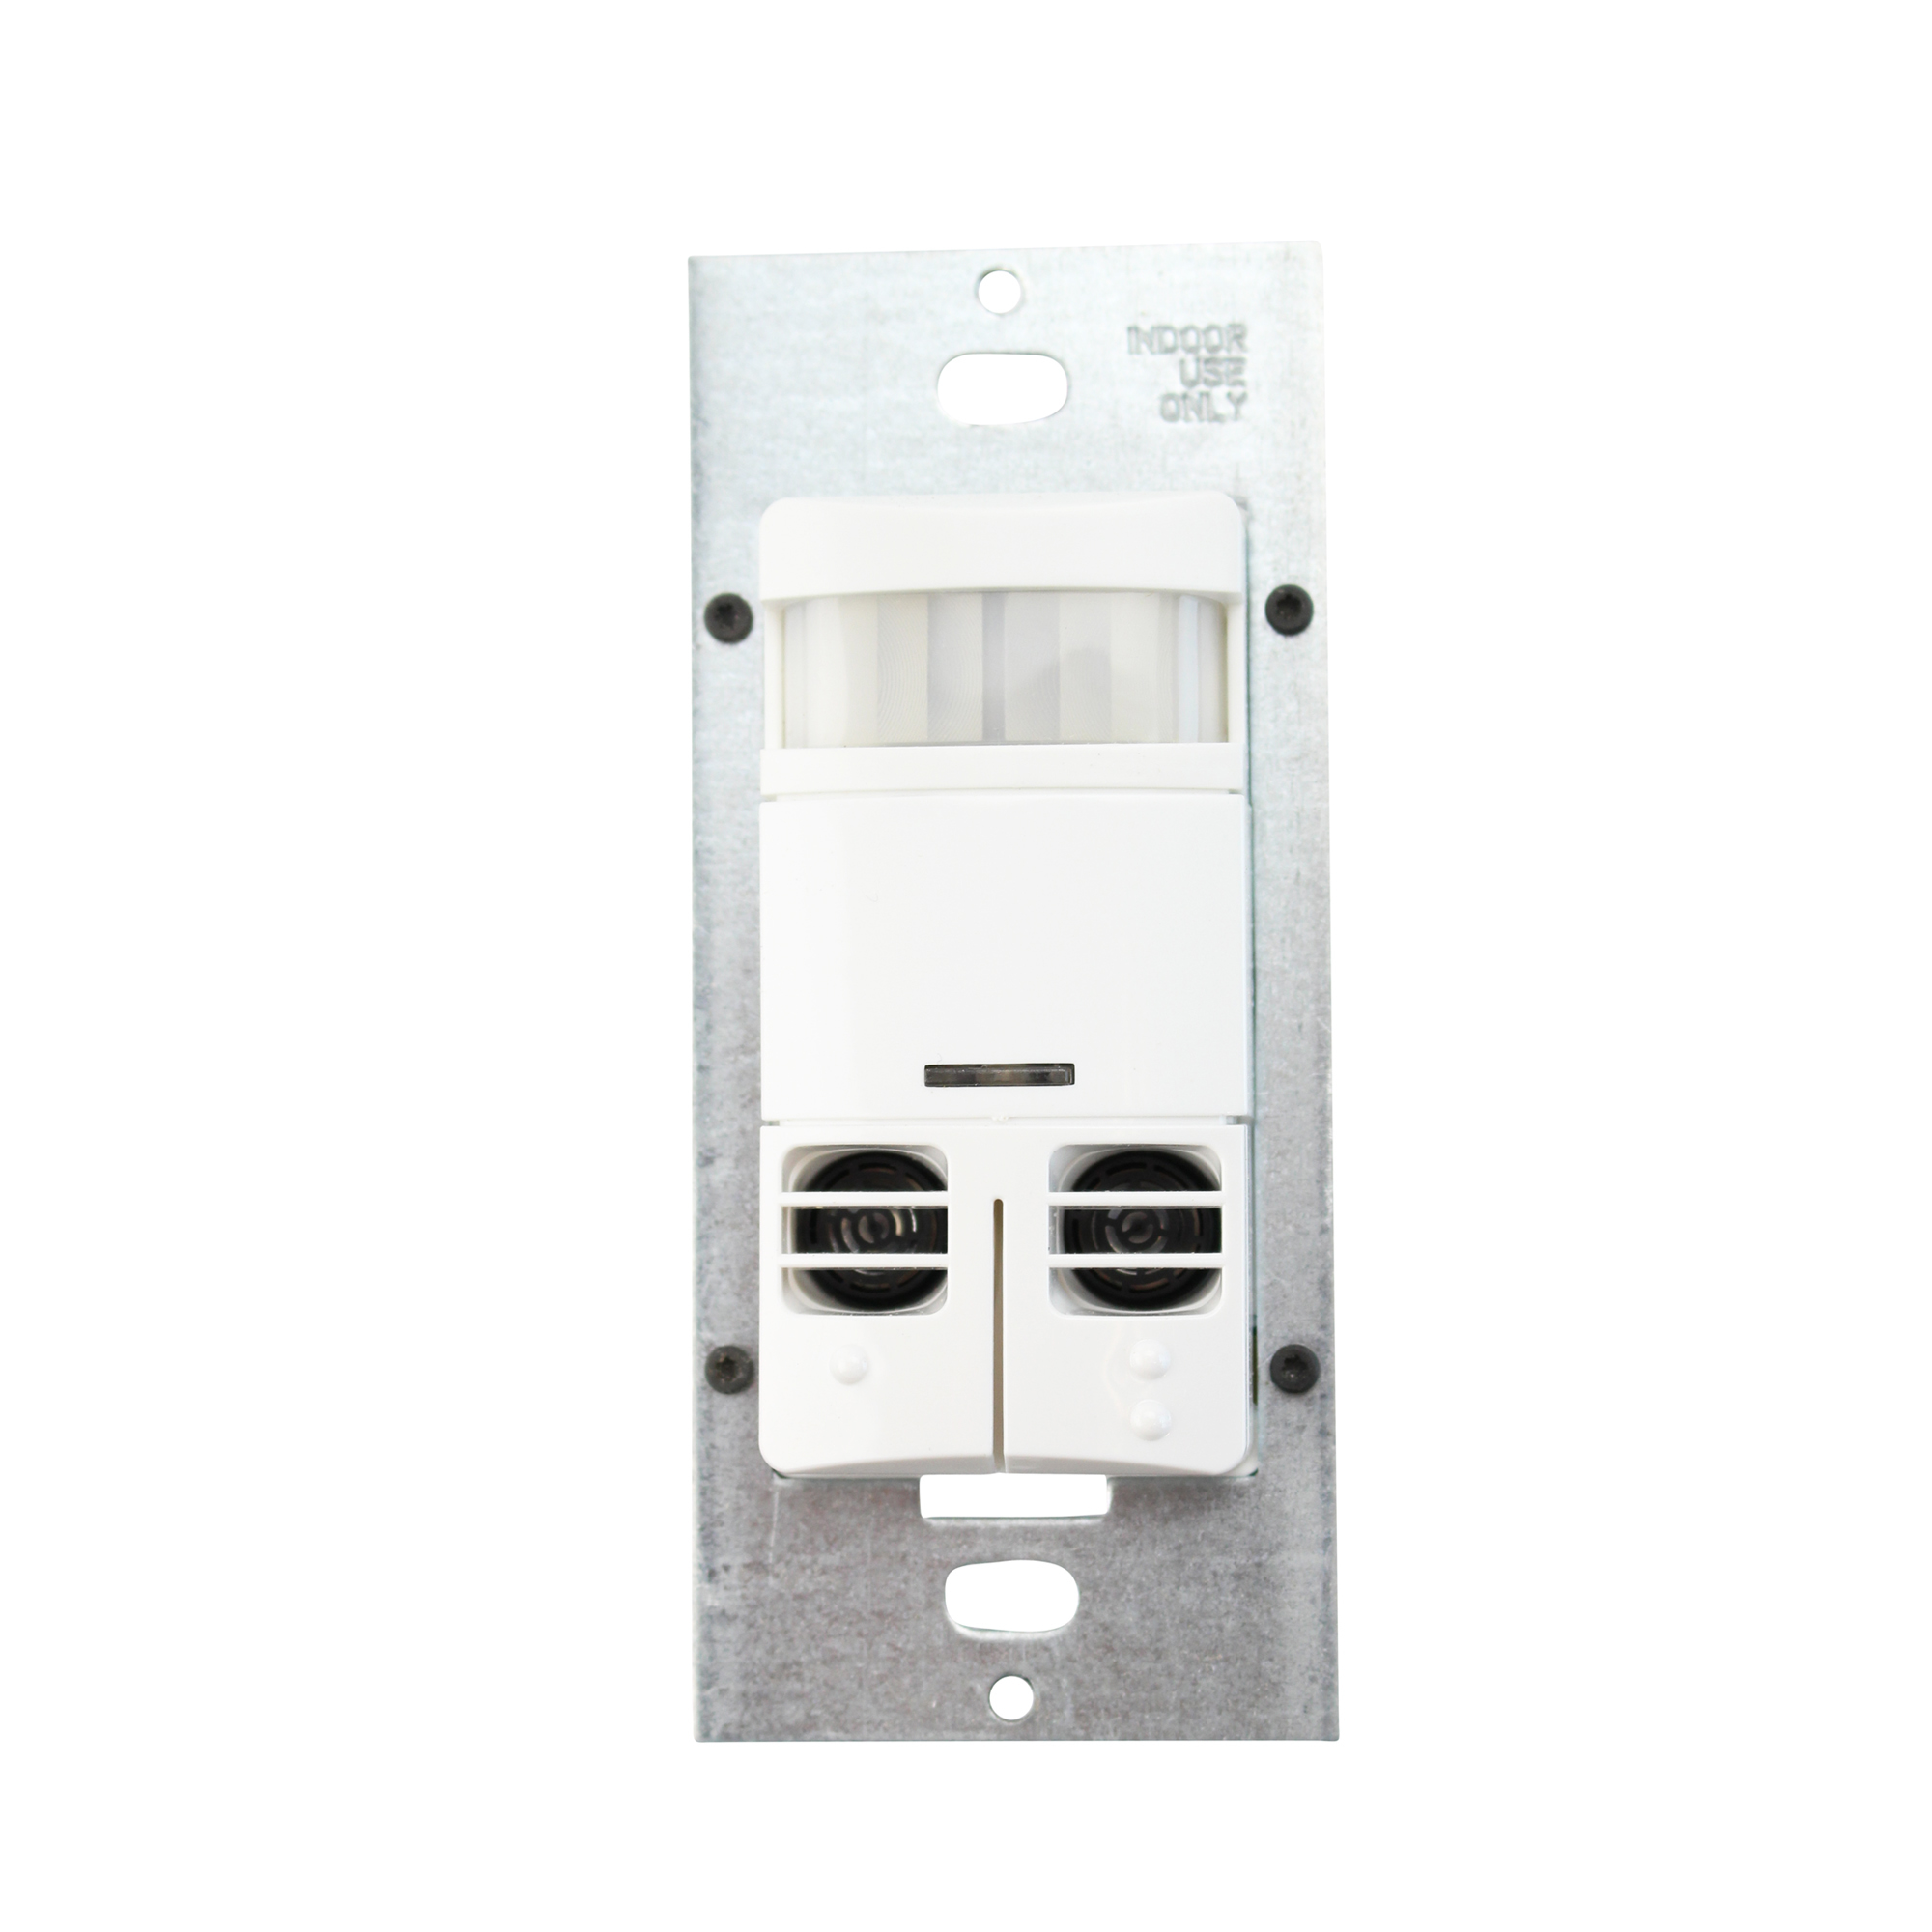 Philips LRS222500 Wall Switch Occupancy Sensor Dual Relay...